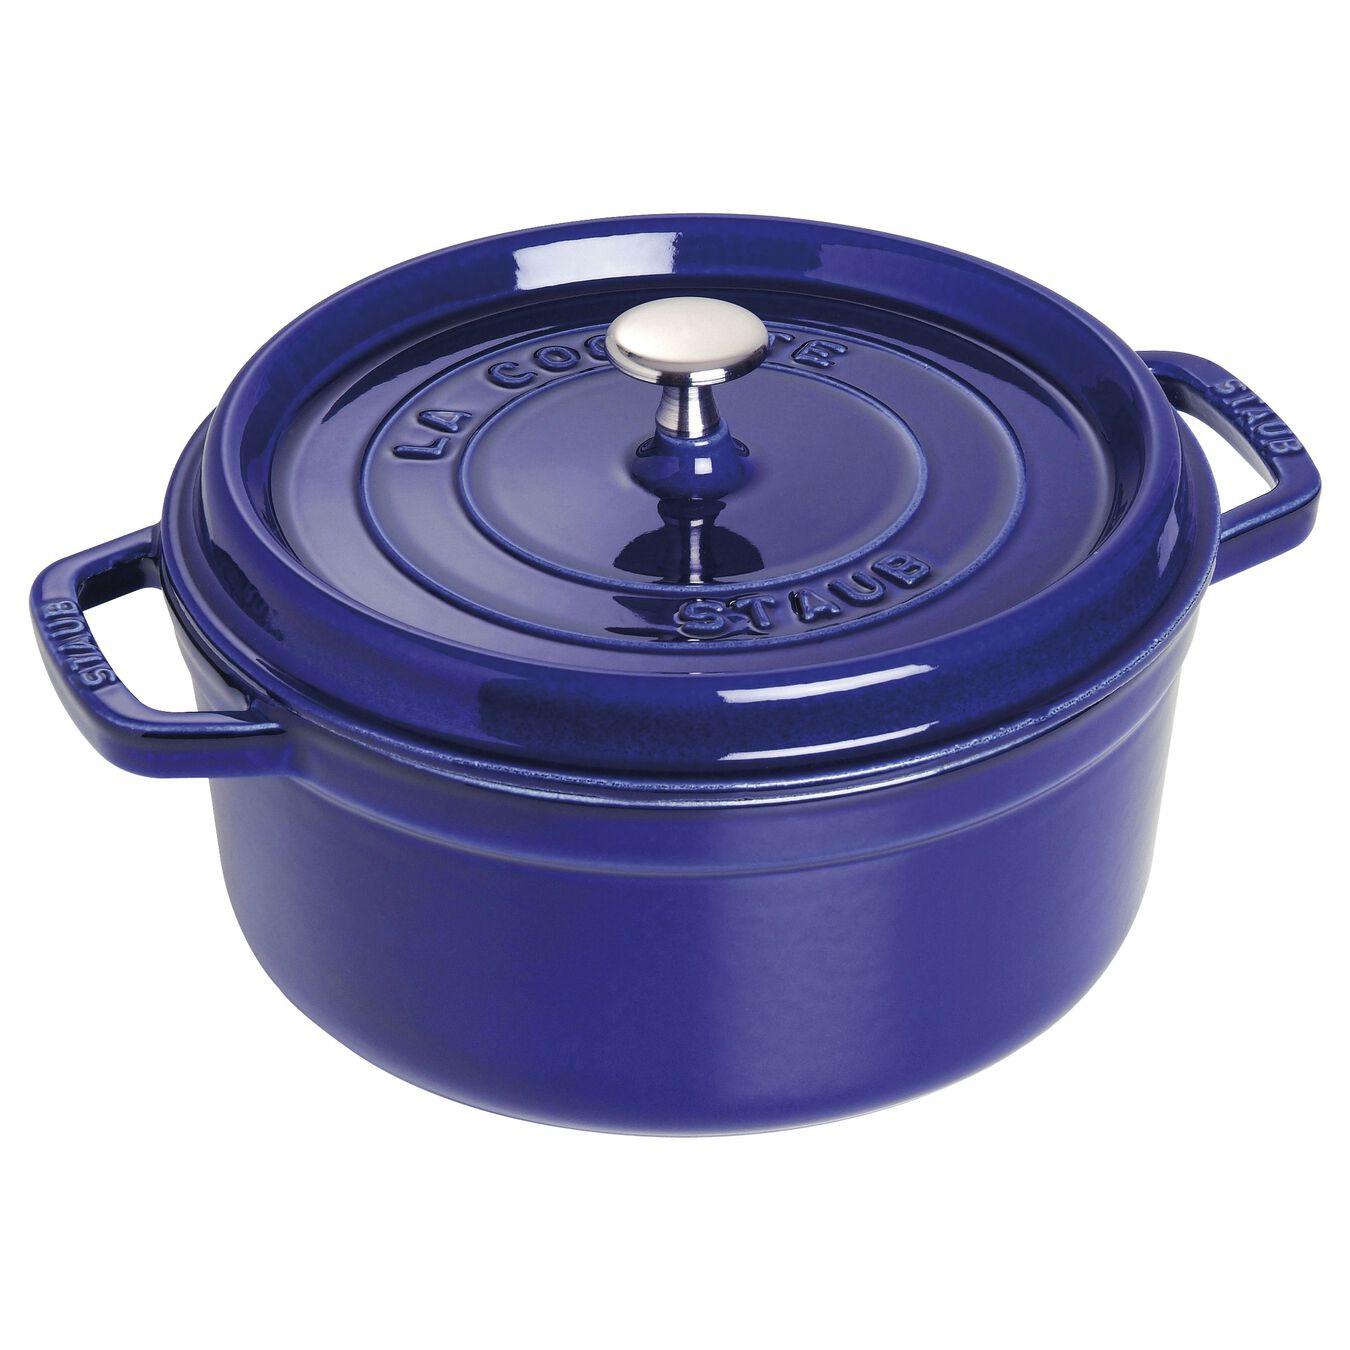 4-qt Round Cocotte - Dark Blue,,large 1